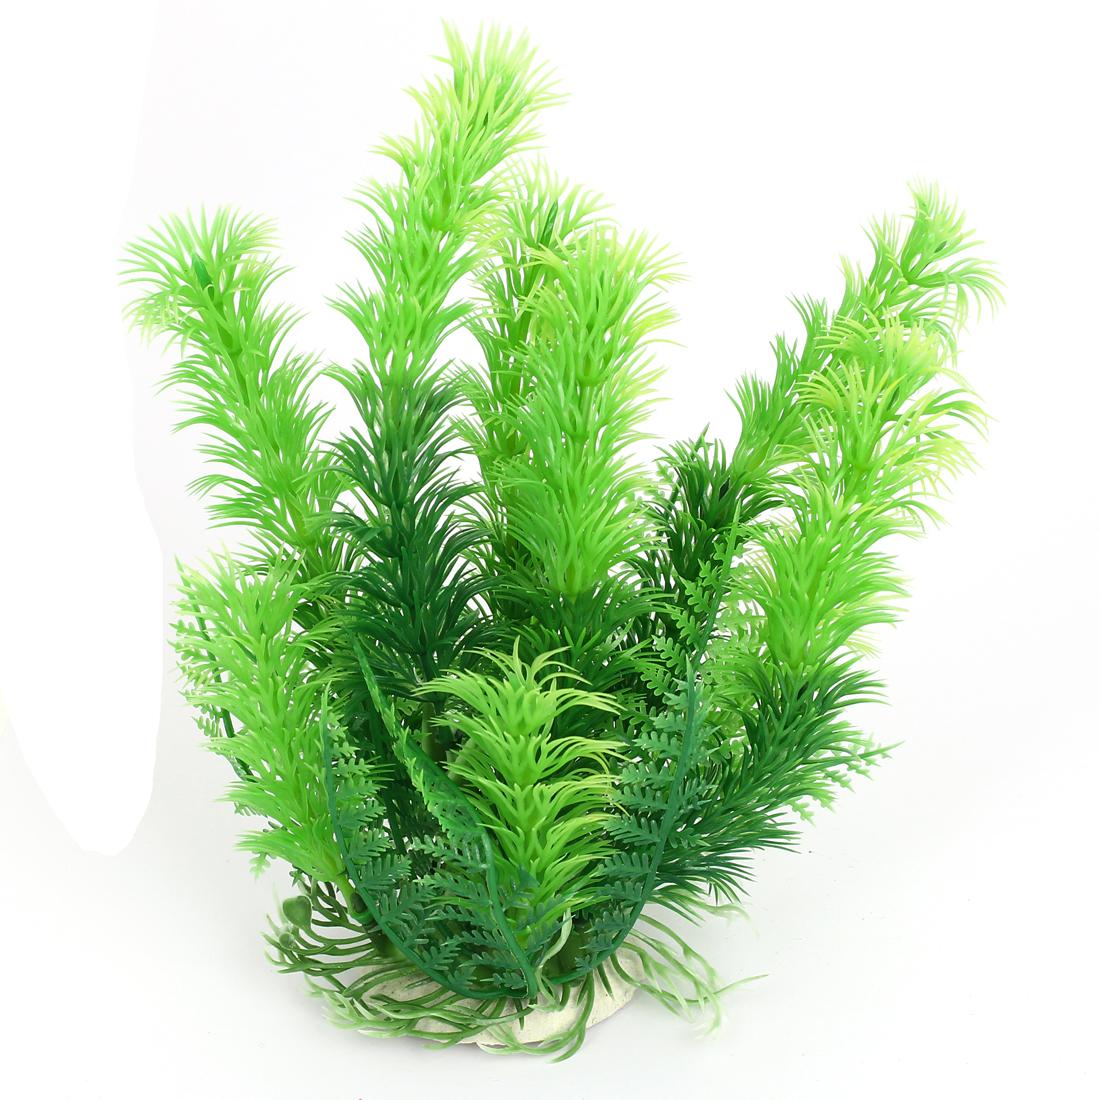 Aquarium Fish Tank Simulated Artificial Water Plant Grass Decor Ornament Green